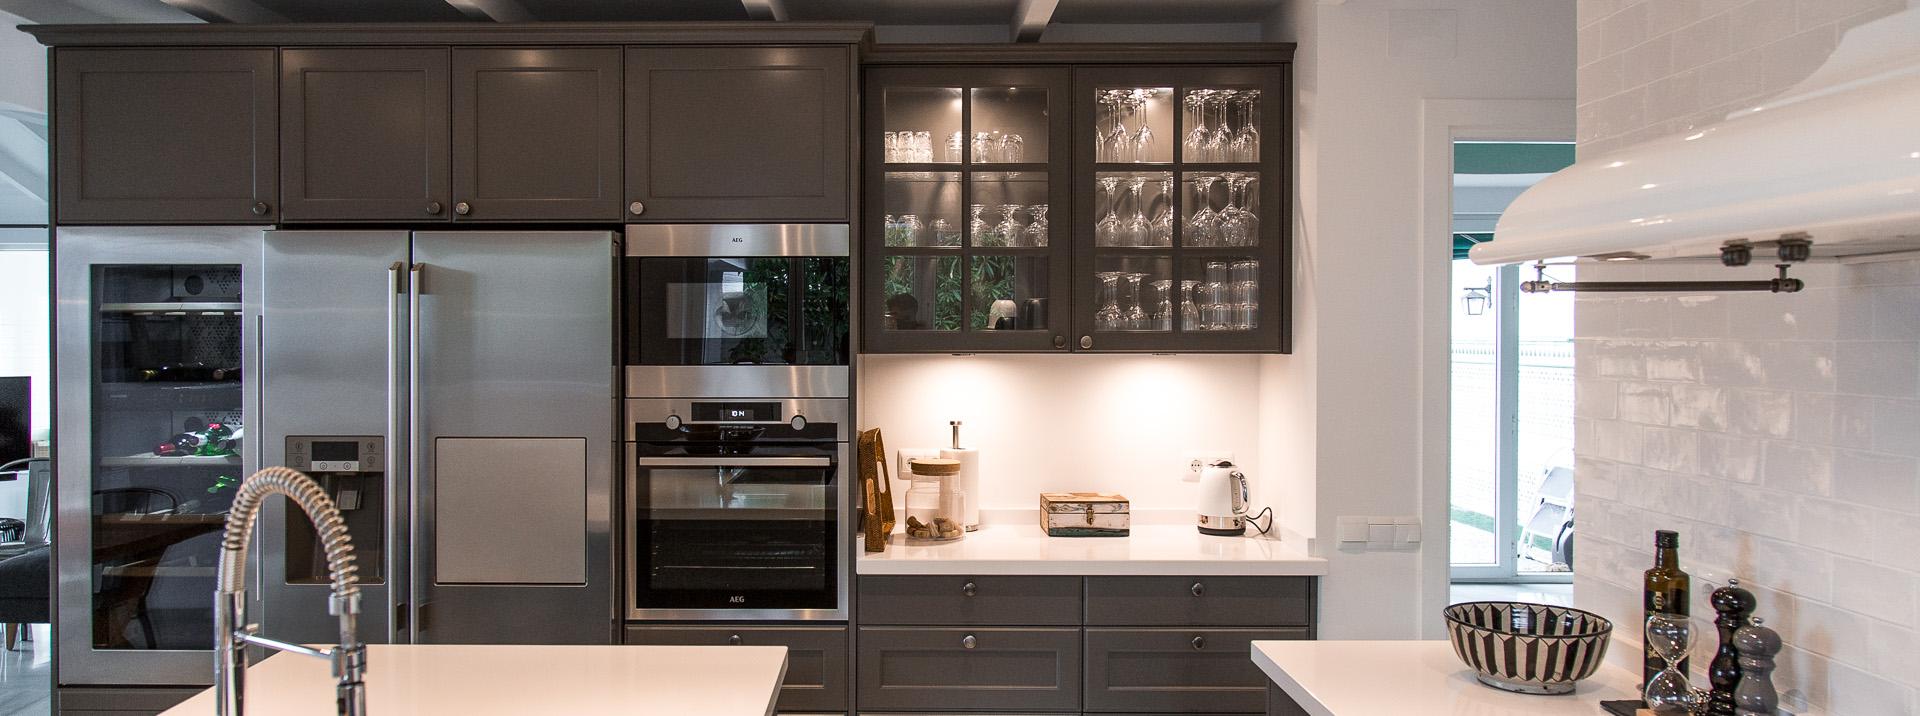 Nordic Muebles - Kitchens - Classic - Svendborg